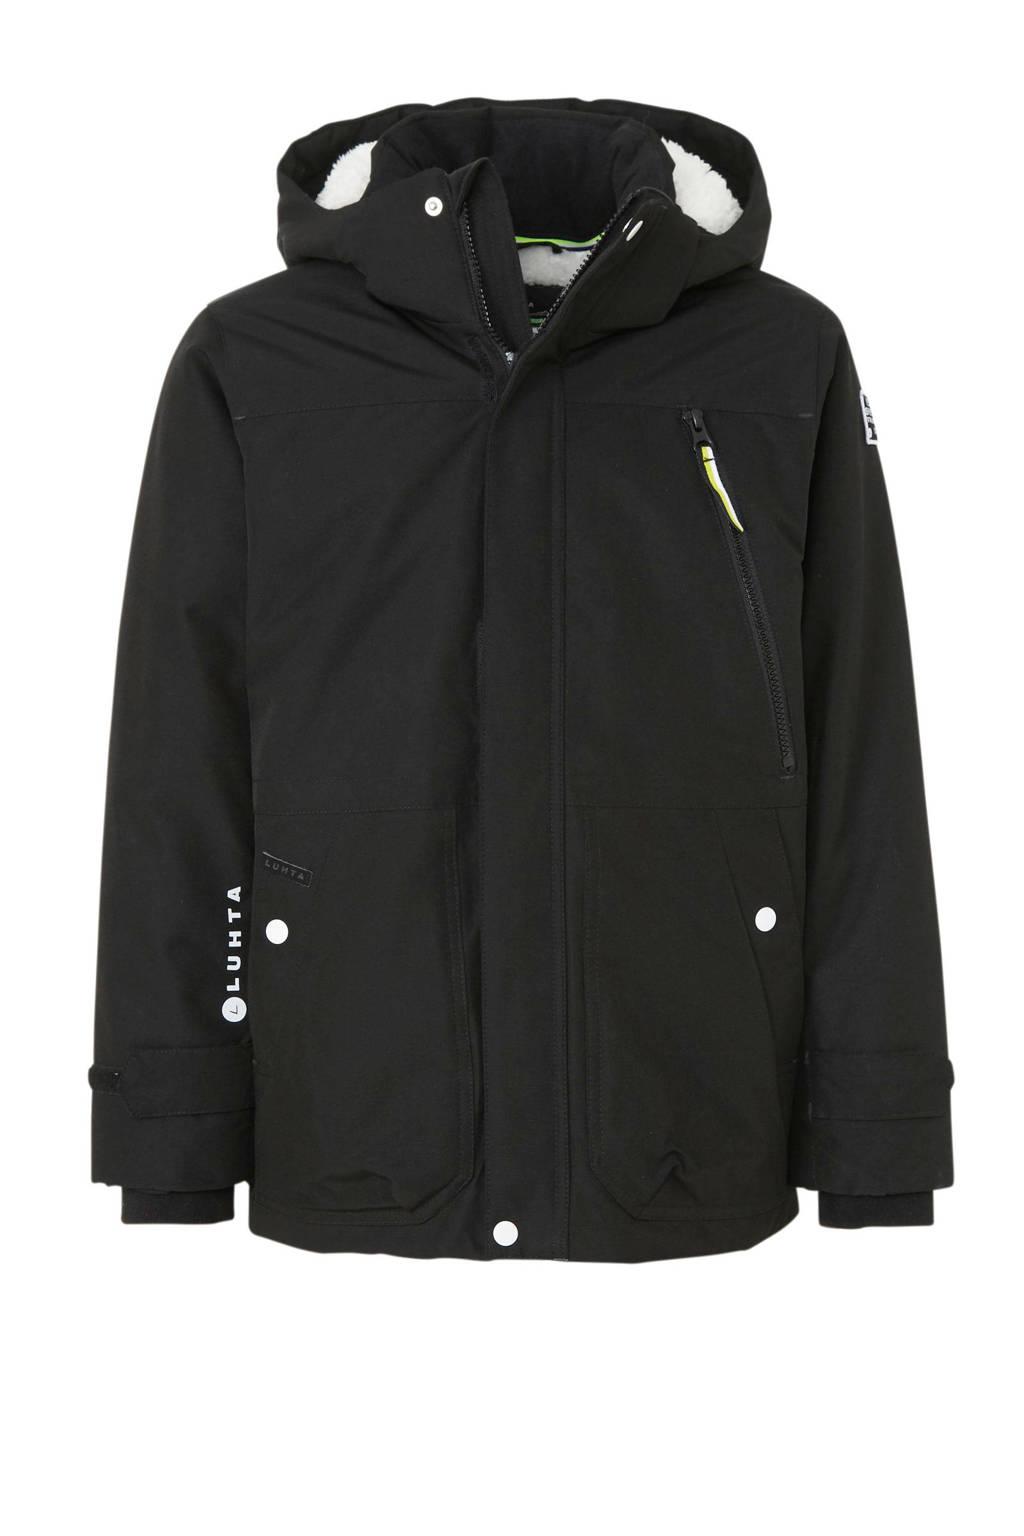 Luhta winterjas Lenka zwart, Zwart